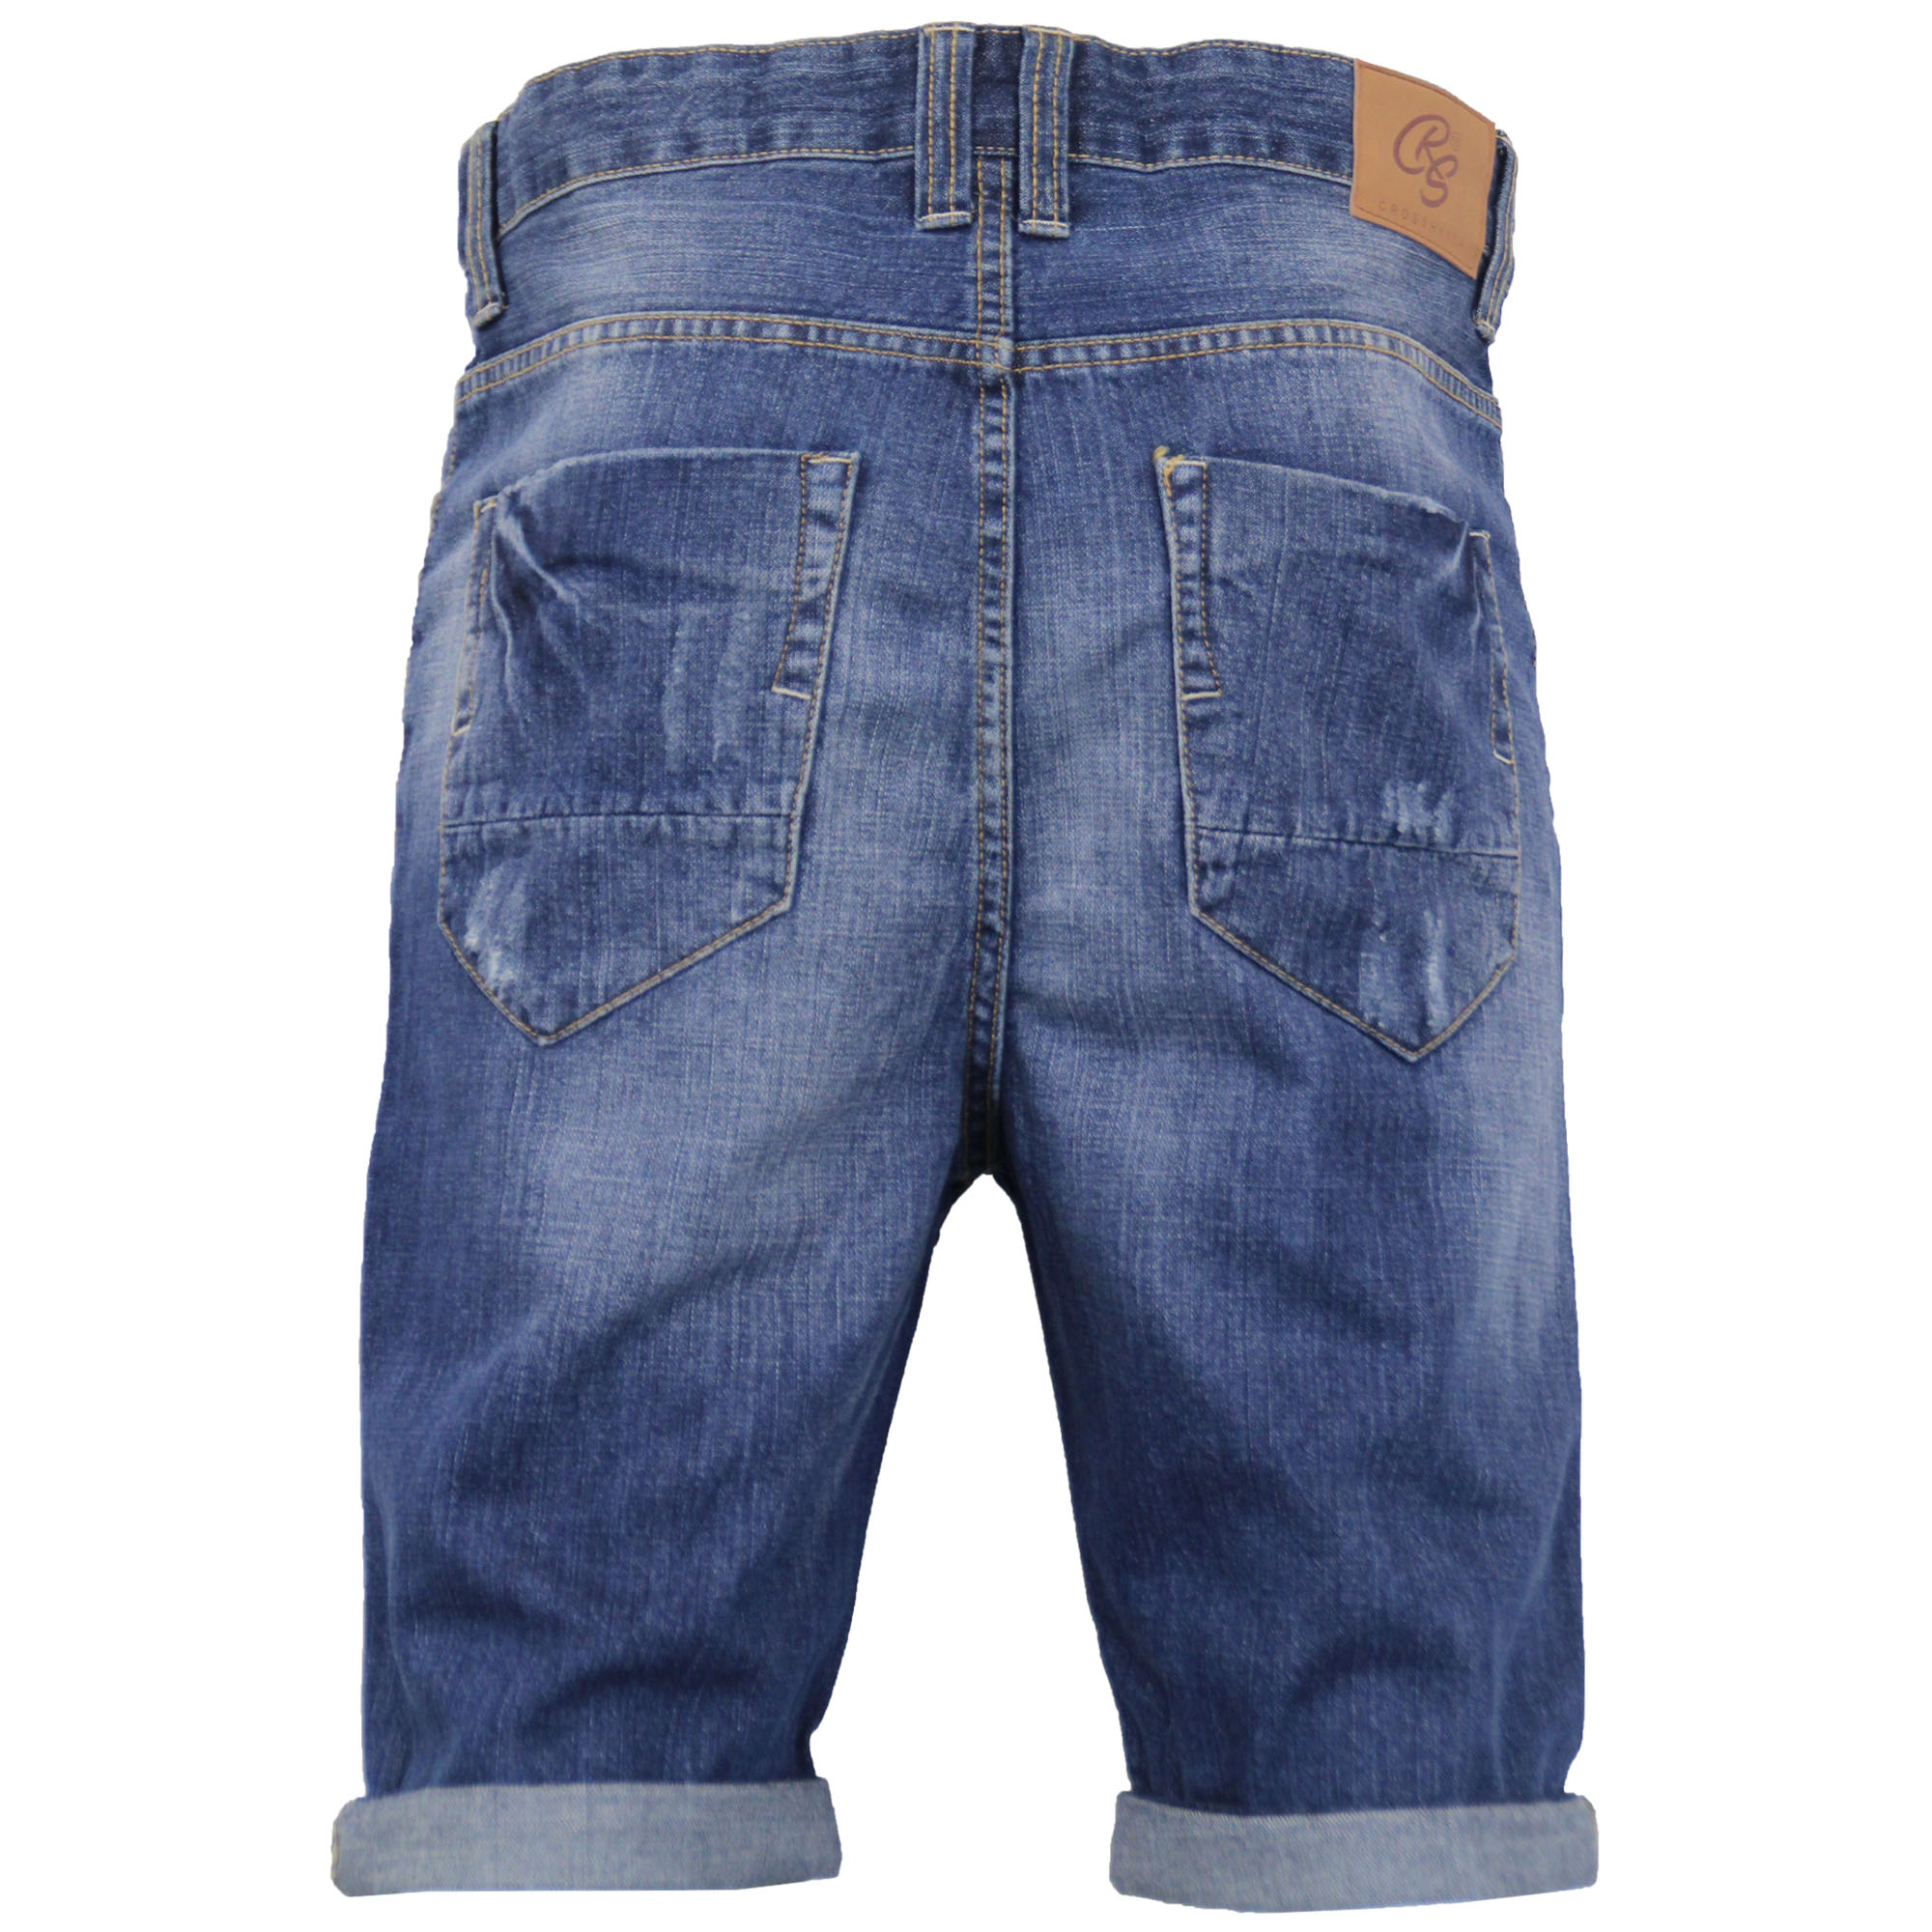 Mens-Crosshatch-Denim-Knee-Length-Combat-Shorts-Cargo-Casual-Fashion-Summer-New 縮圖 21